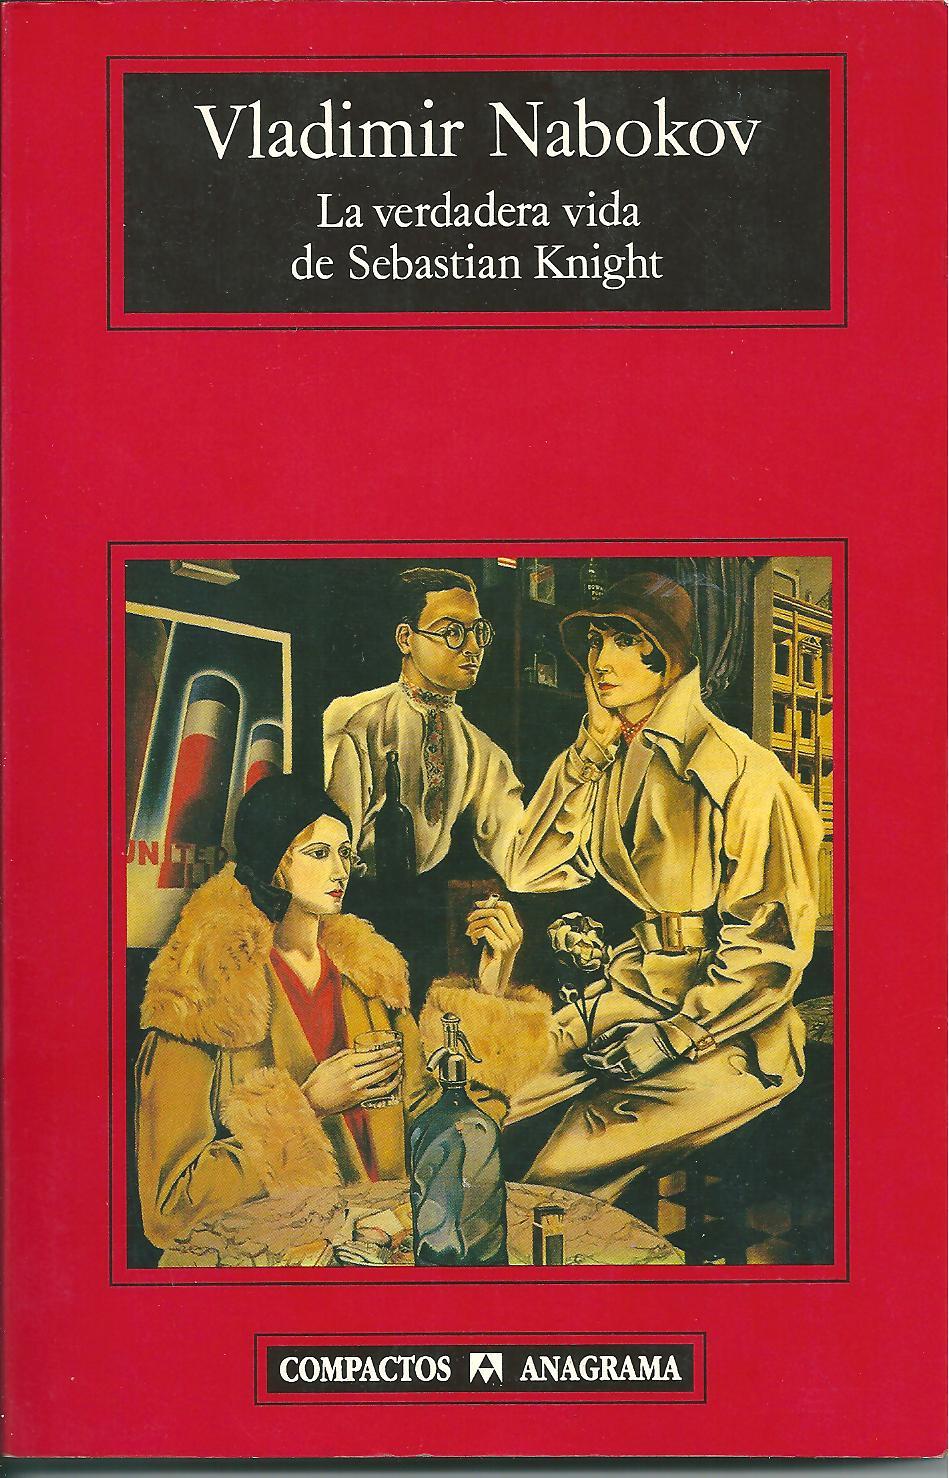 La verdadera historia de Sebastián Knight